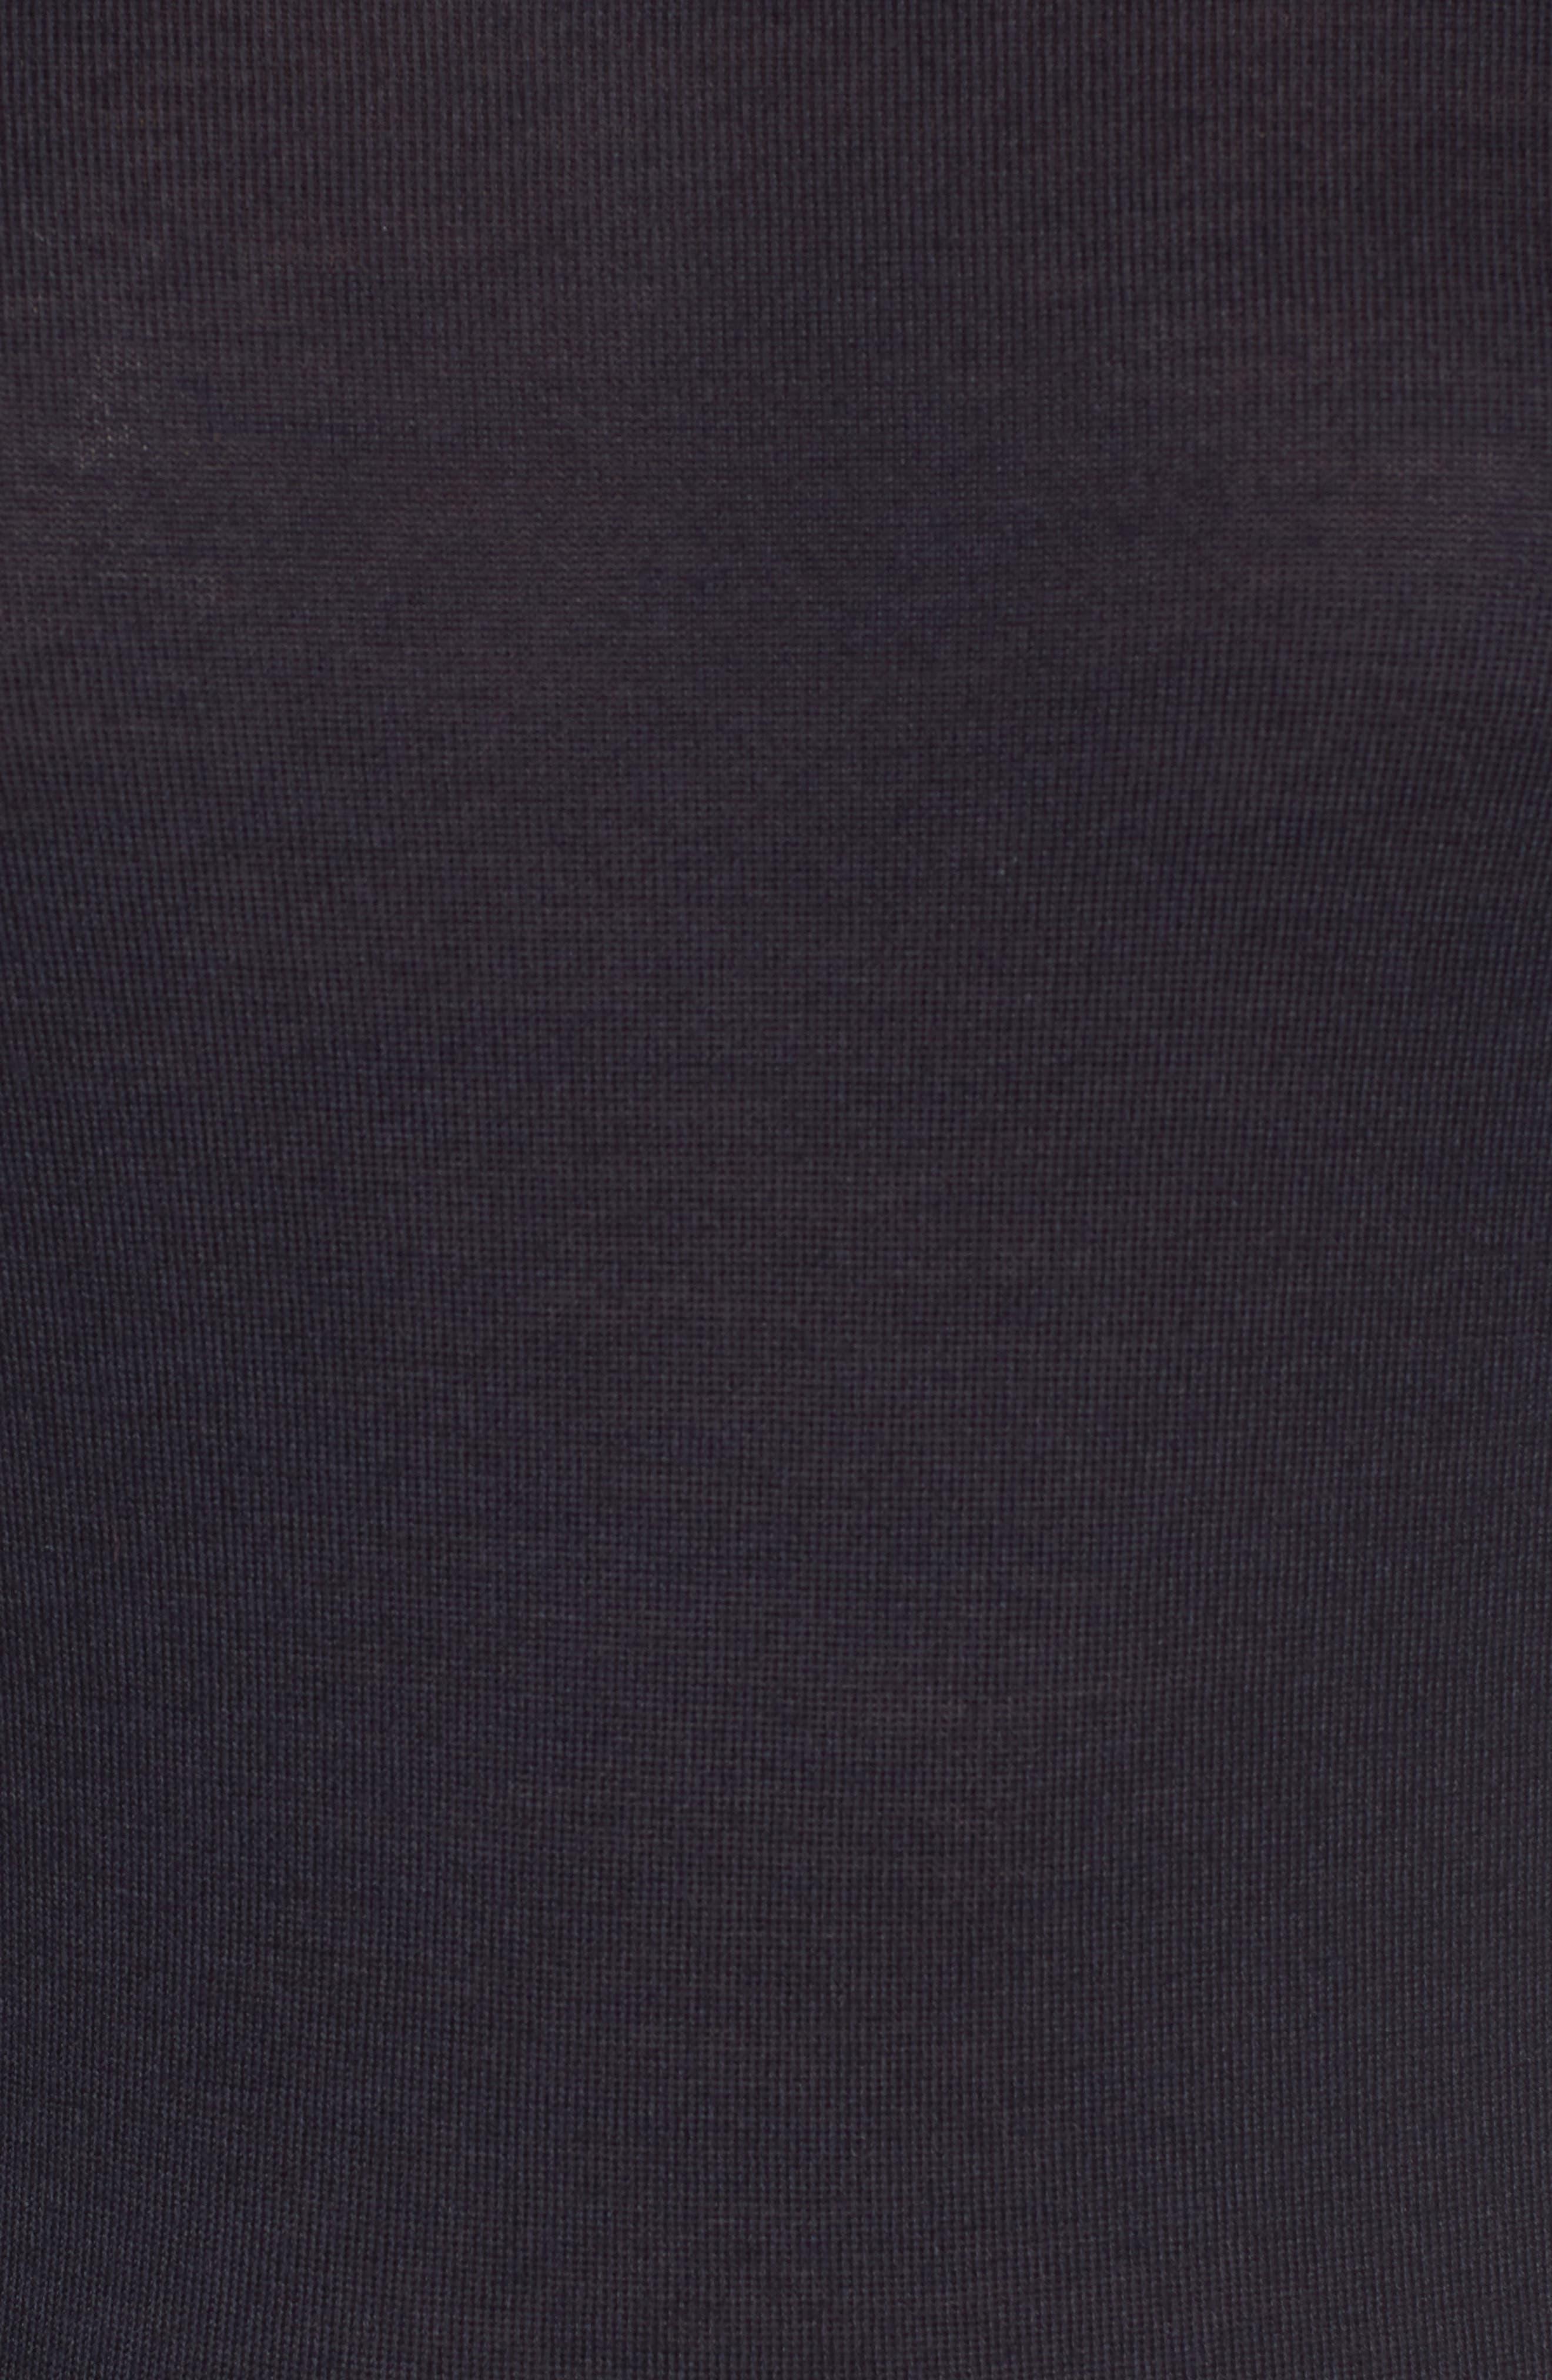 Femma Wool Sweater,                             Alternate thumbnail 5, color,                             Navy